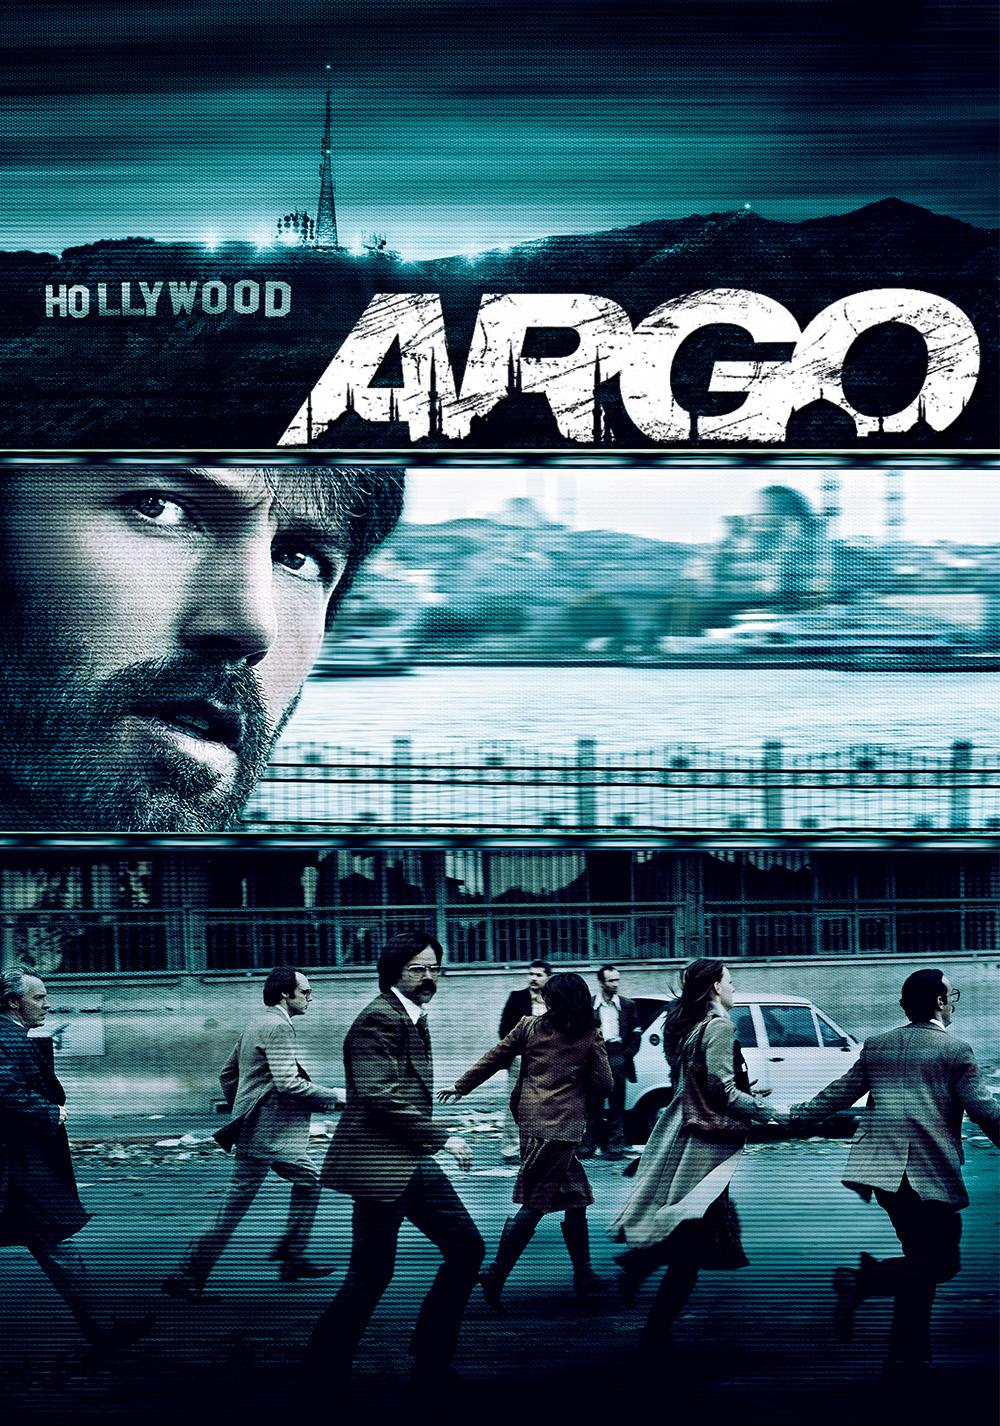 argo-52370088d06bd.jpg